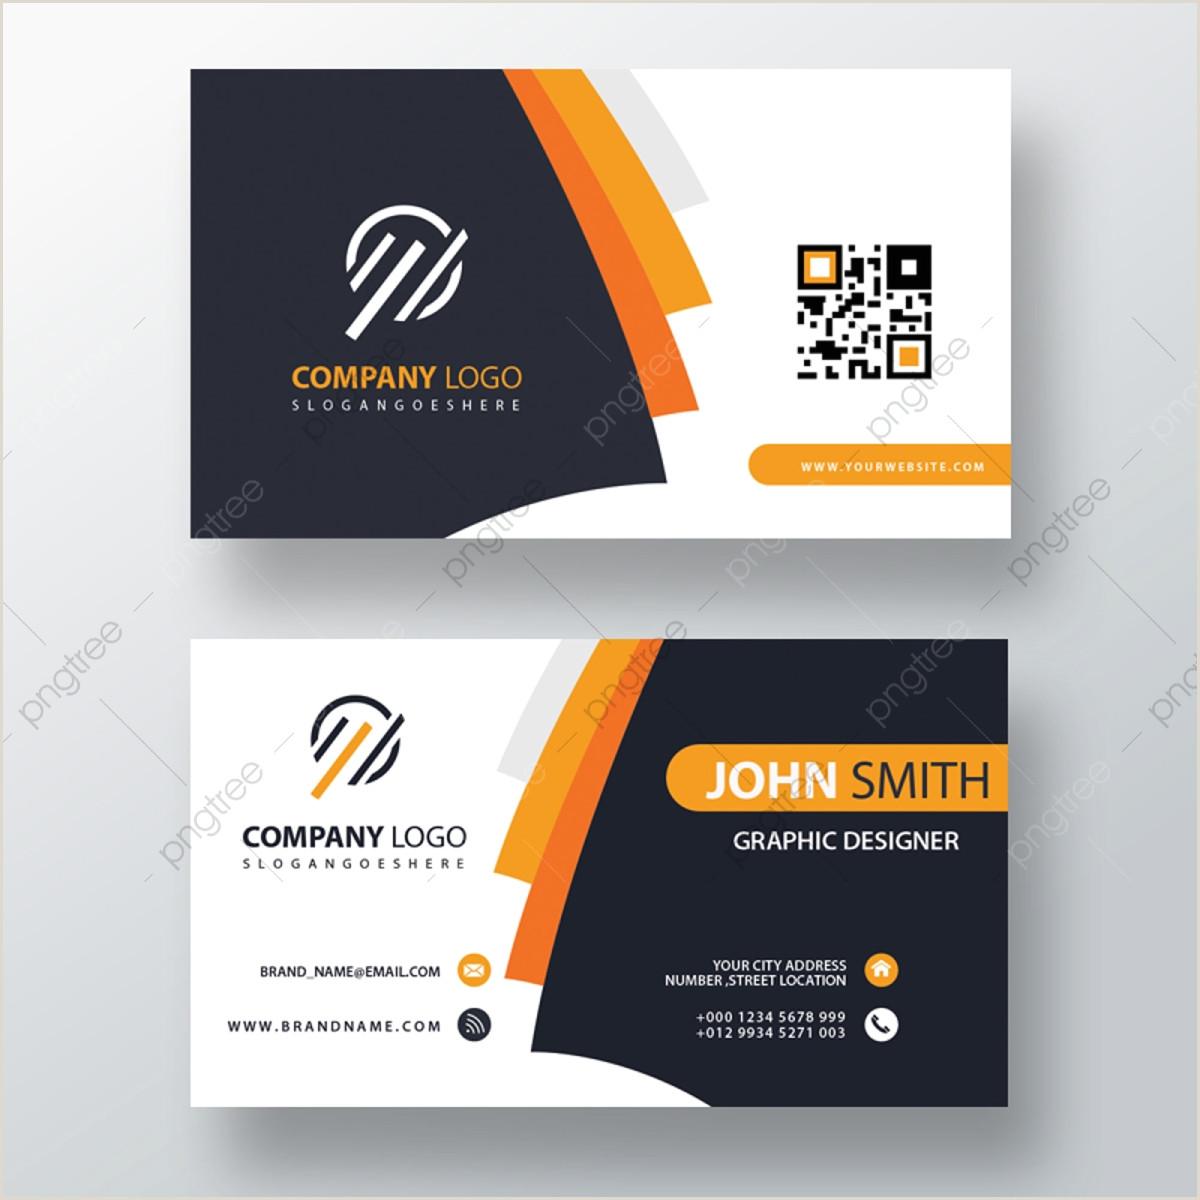 Buisness Card Designs Business Card Design Png